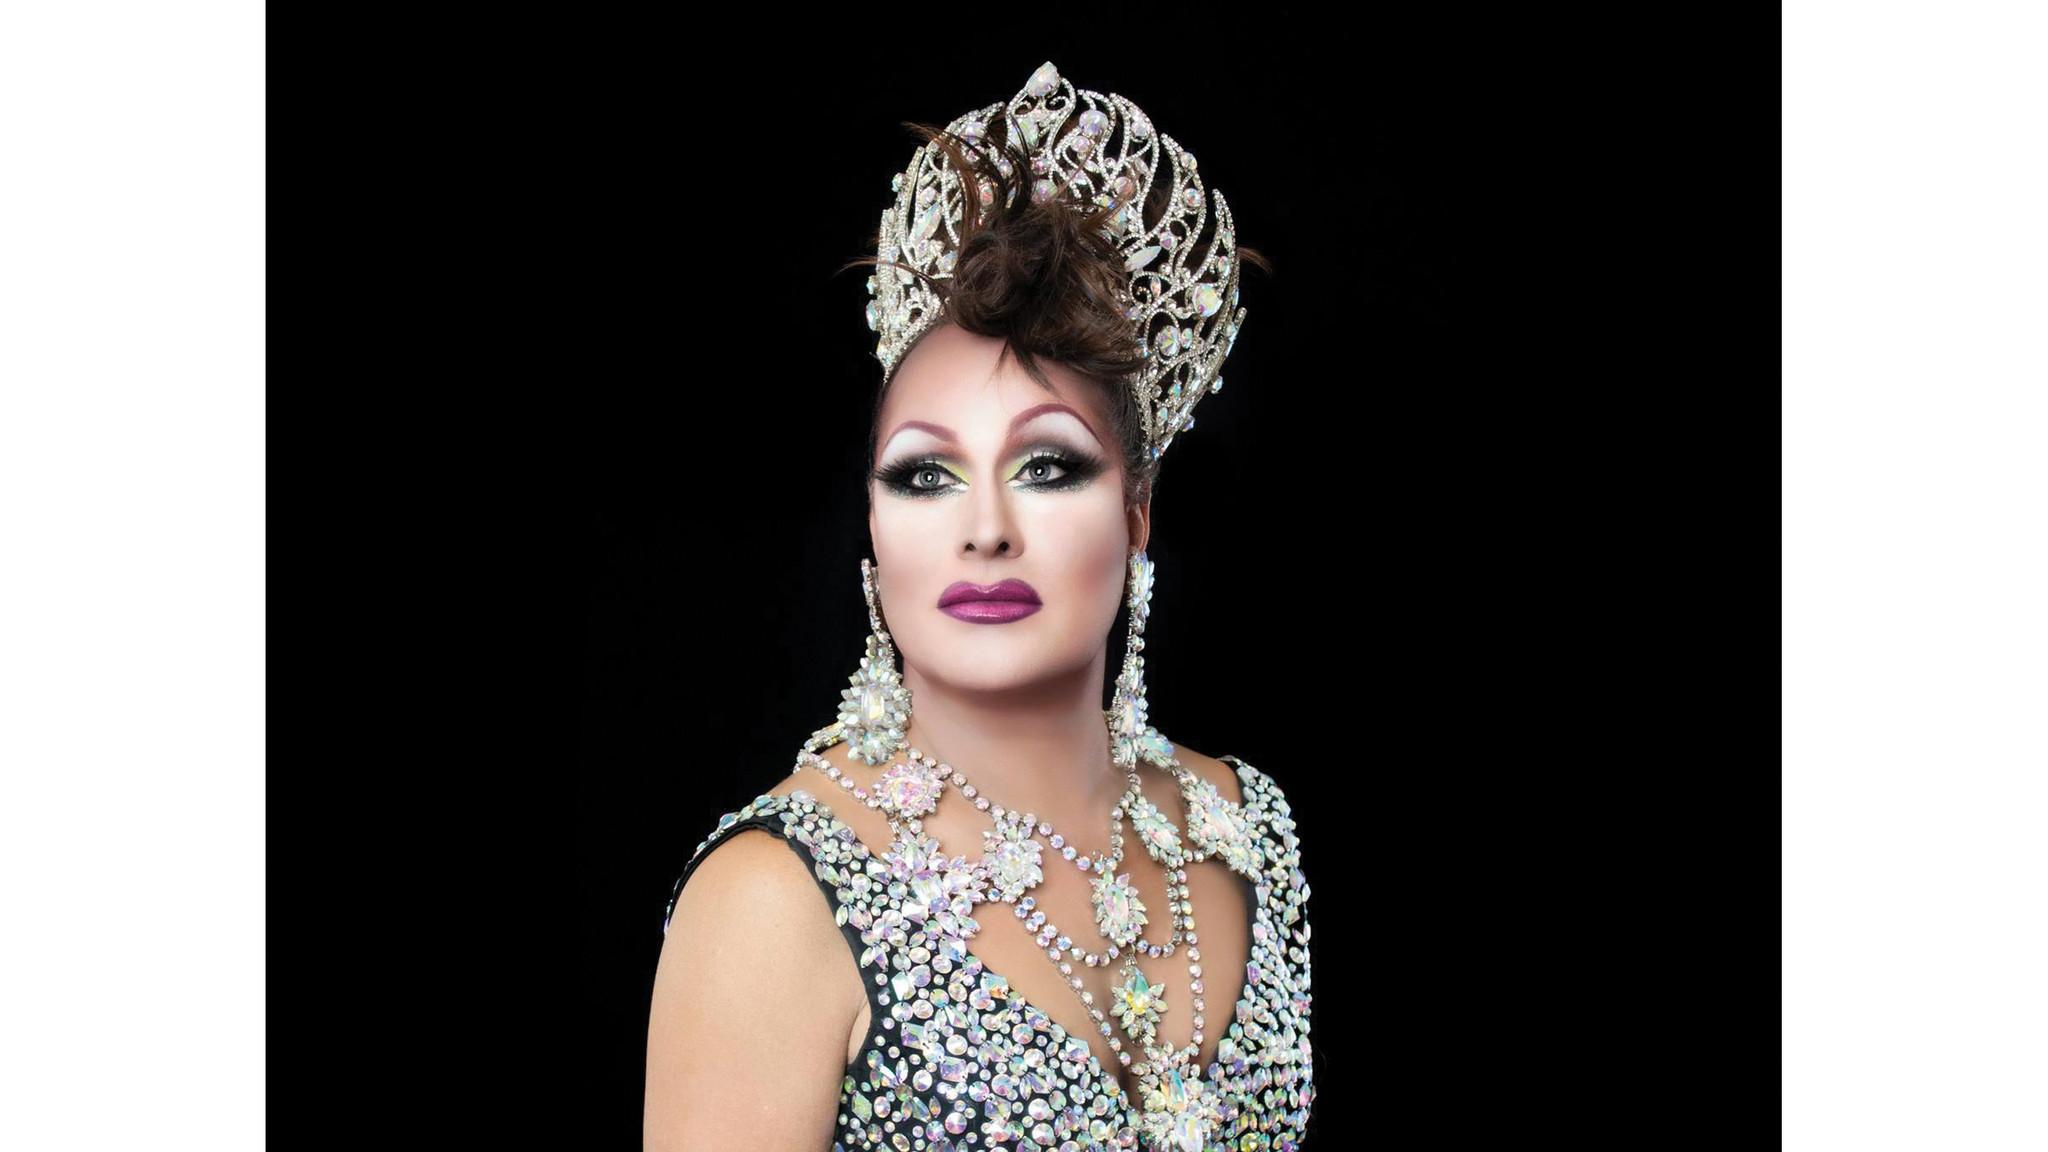 Christina recommends Starlight cabaret at atlanta gay pride